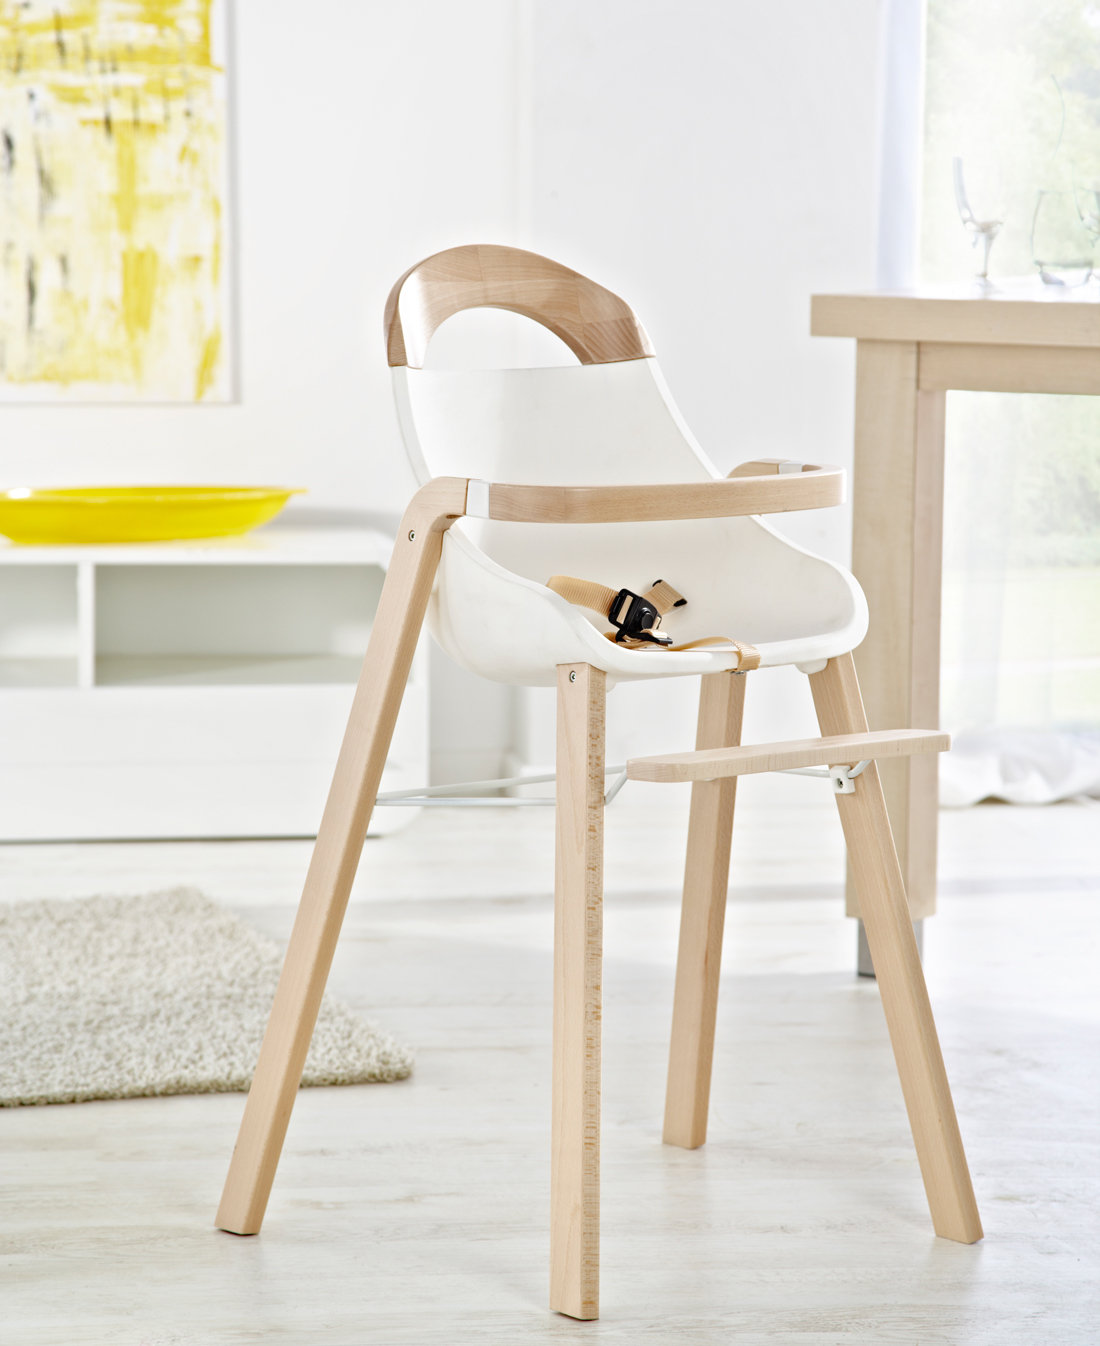 chaise haute adaptable pi ti li. Black Bedroom Furniture Sets. Home Design Ideas